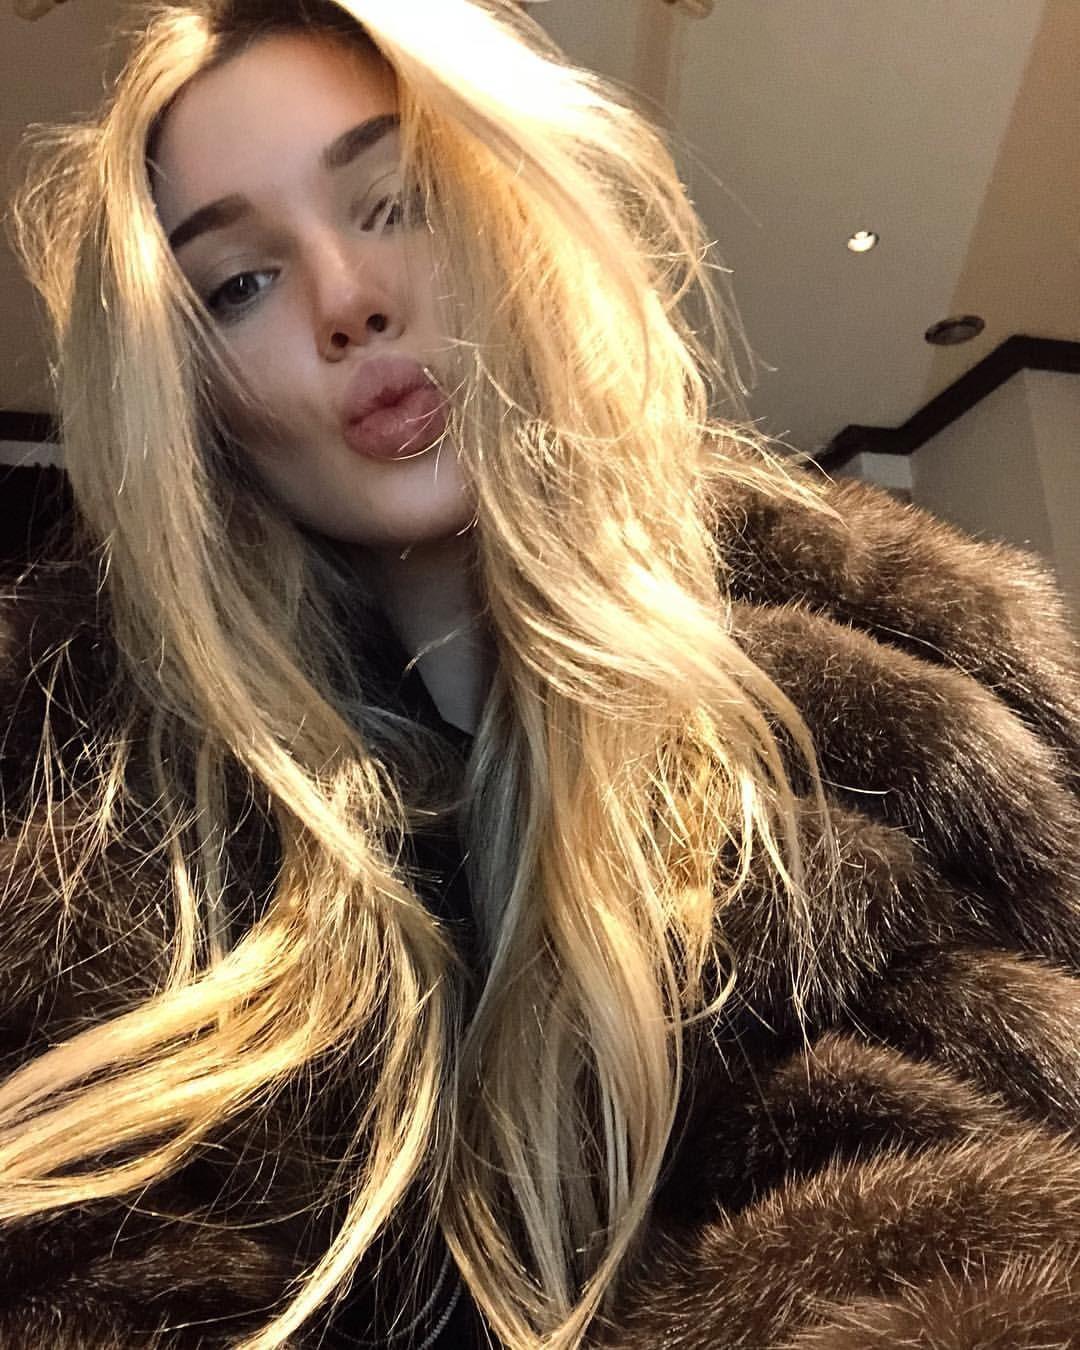 Selfie Ilona Kotelyukh nude (24 photos), Sexy, Paparazzi, Selfie, butt 2019